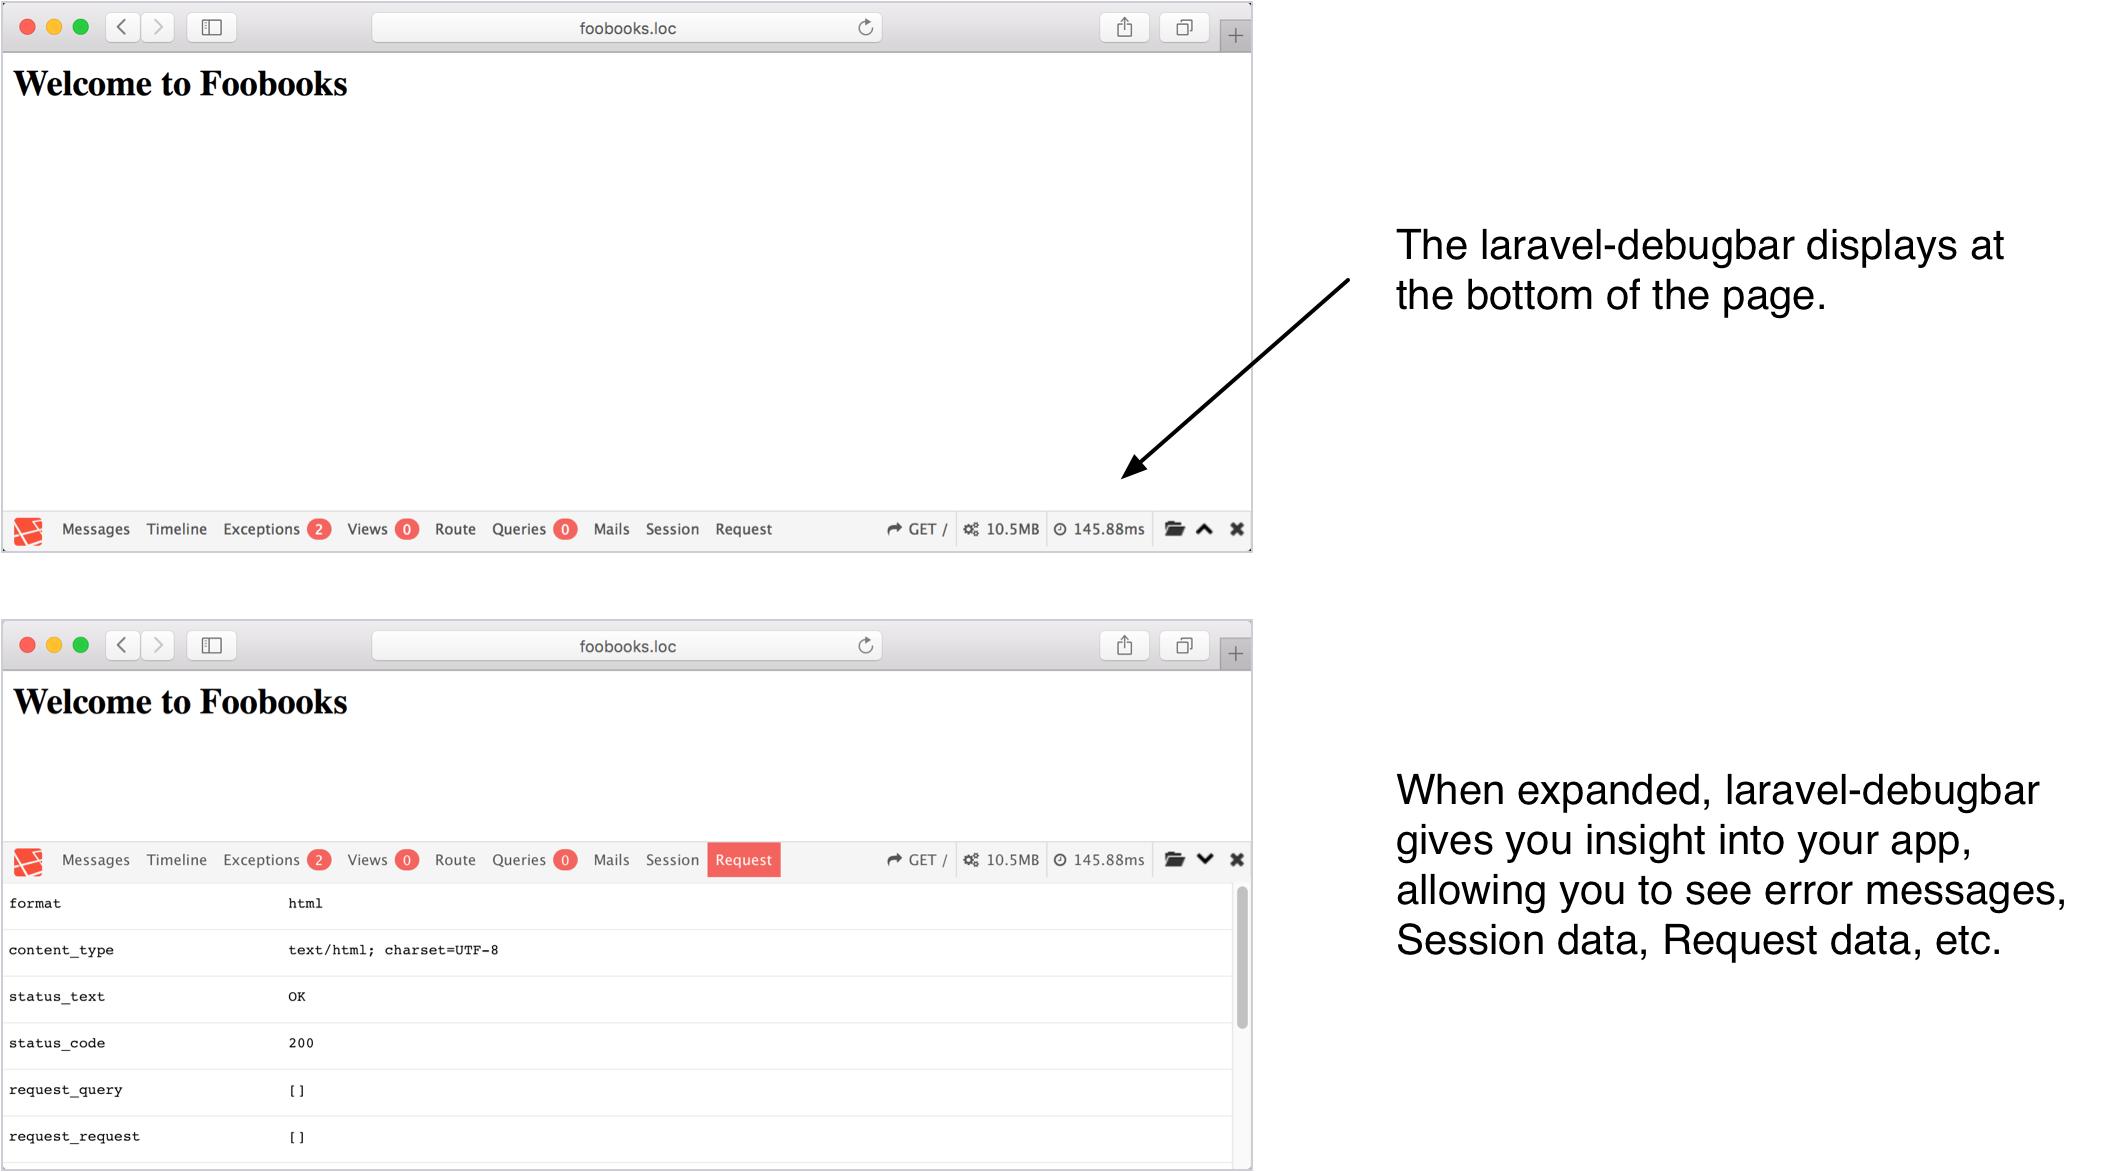 Preview of the laravel-debugbar